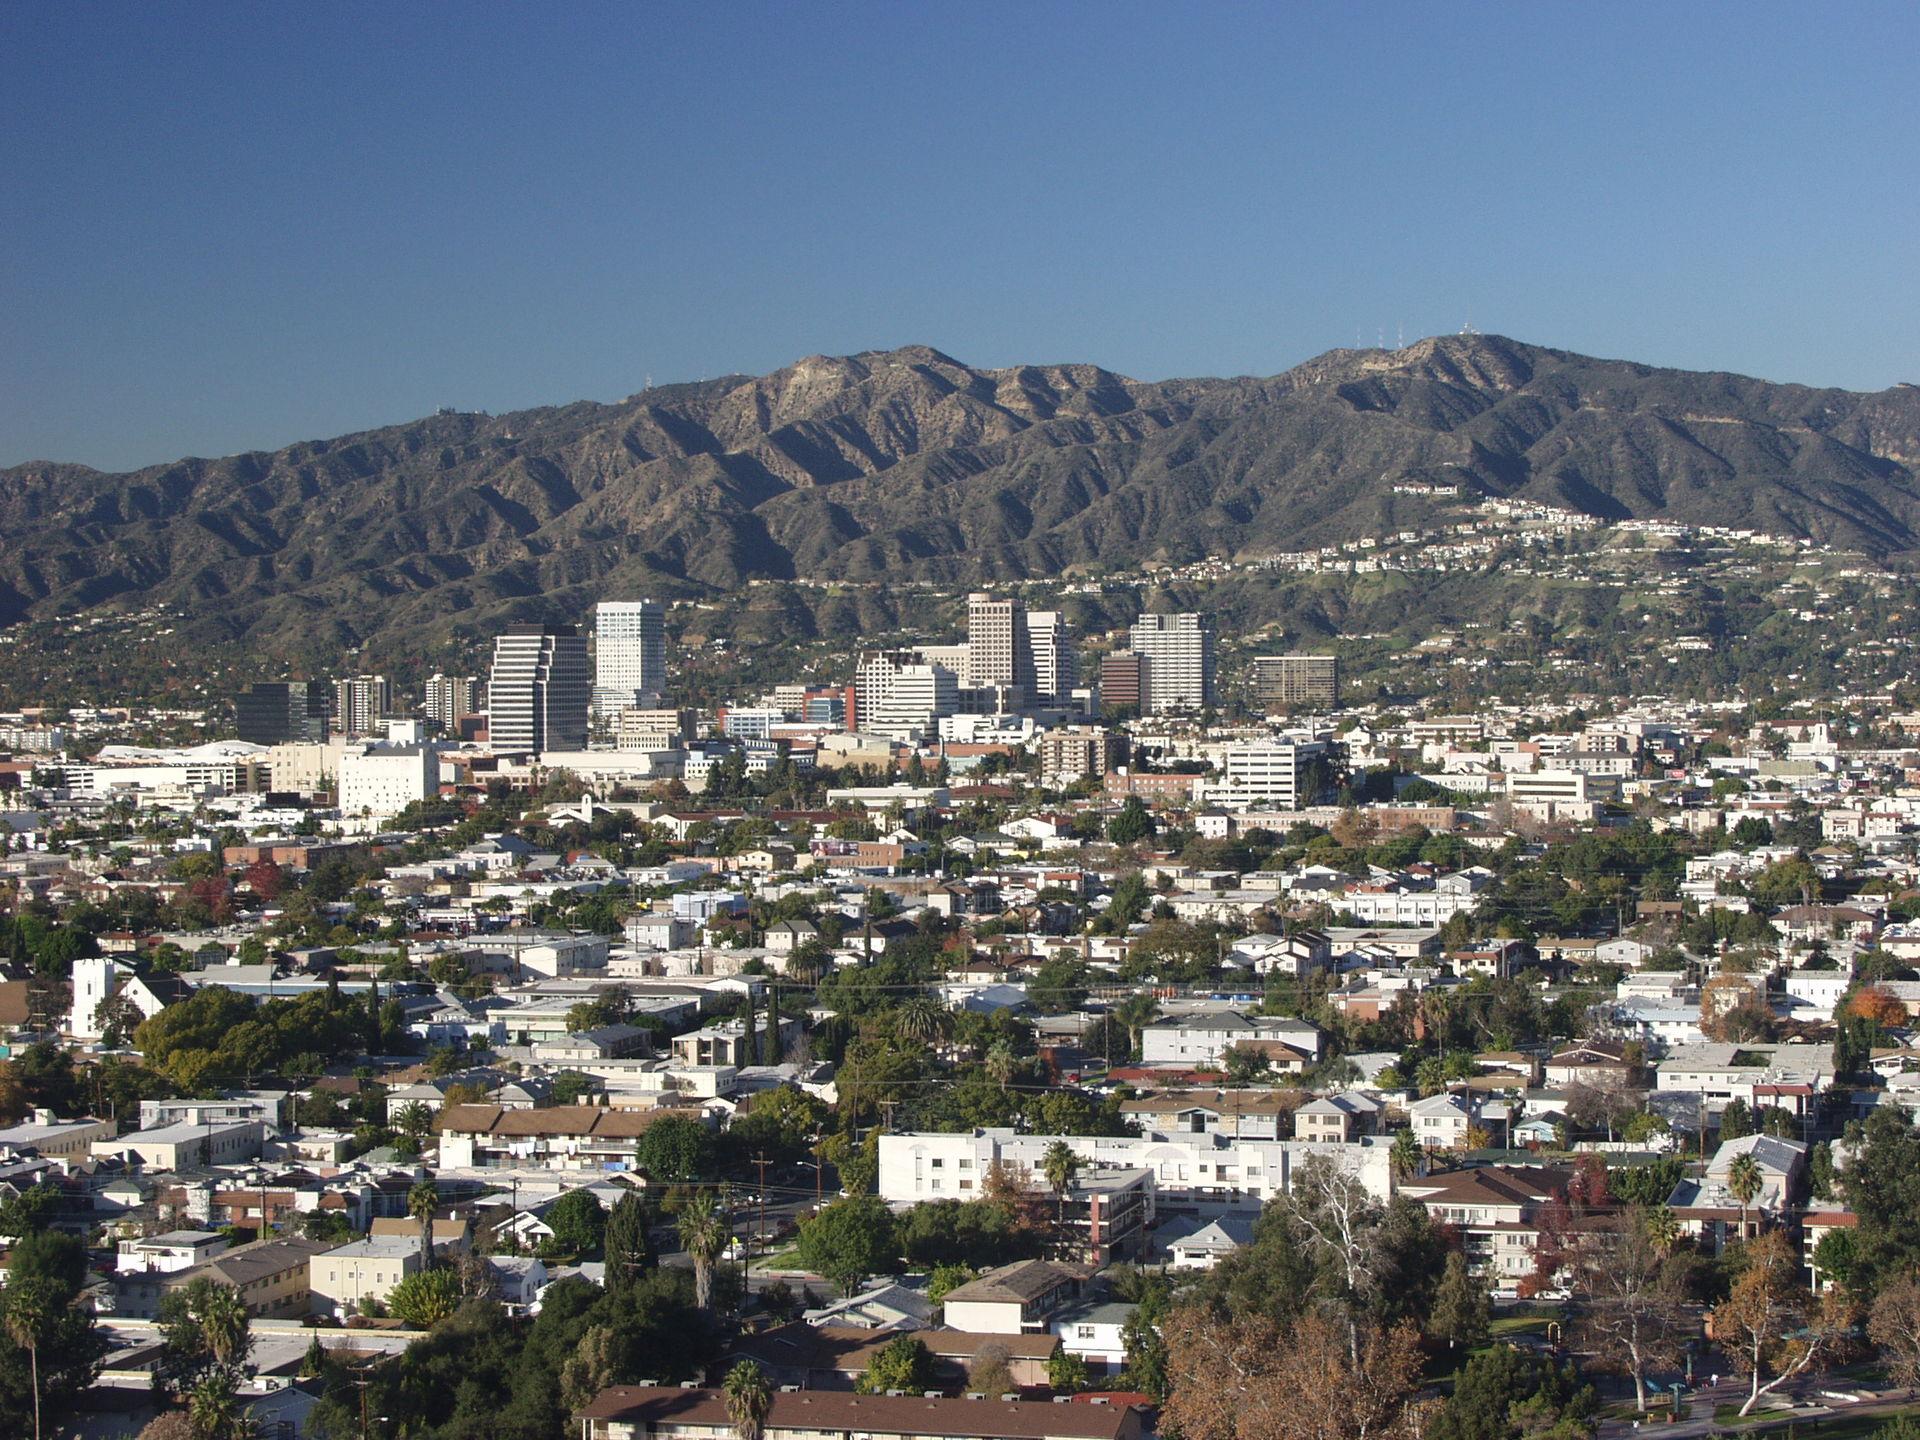 Glendale kalifornia wikipedia wolna encyklopedia for The glendale